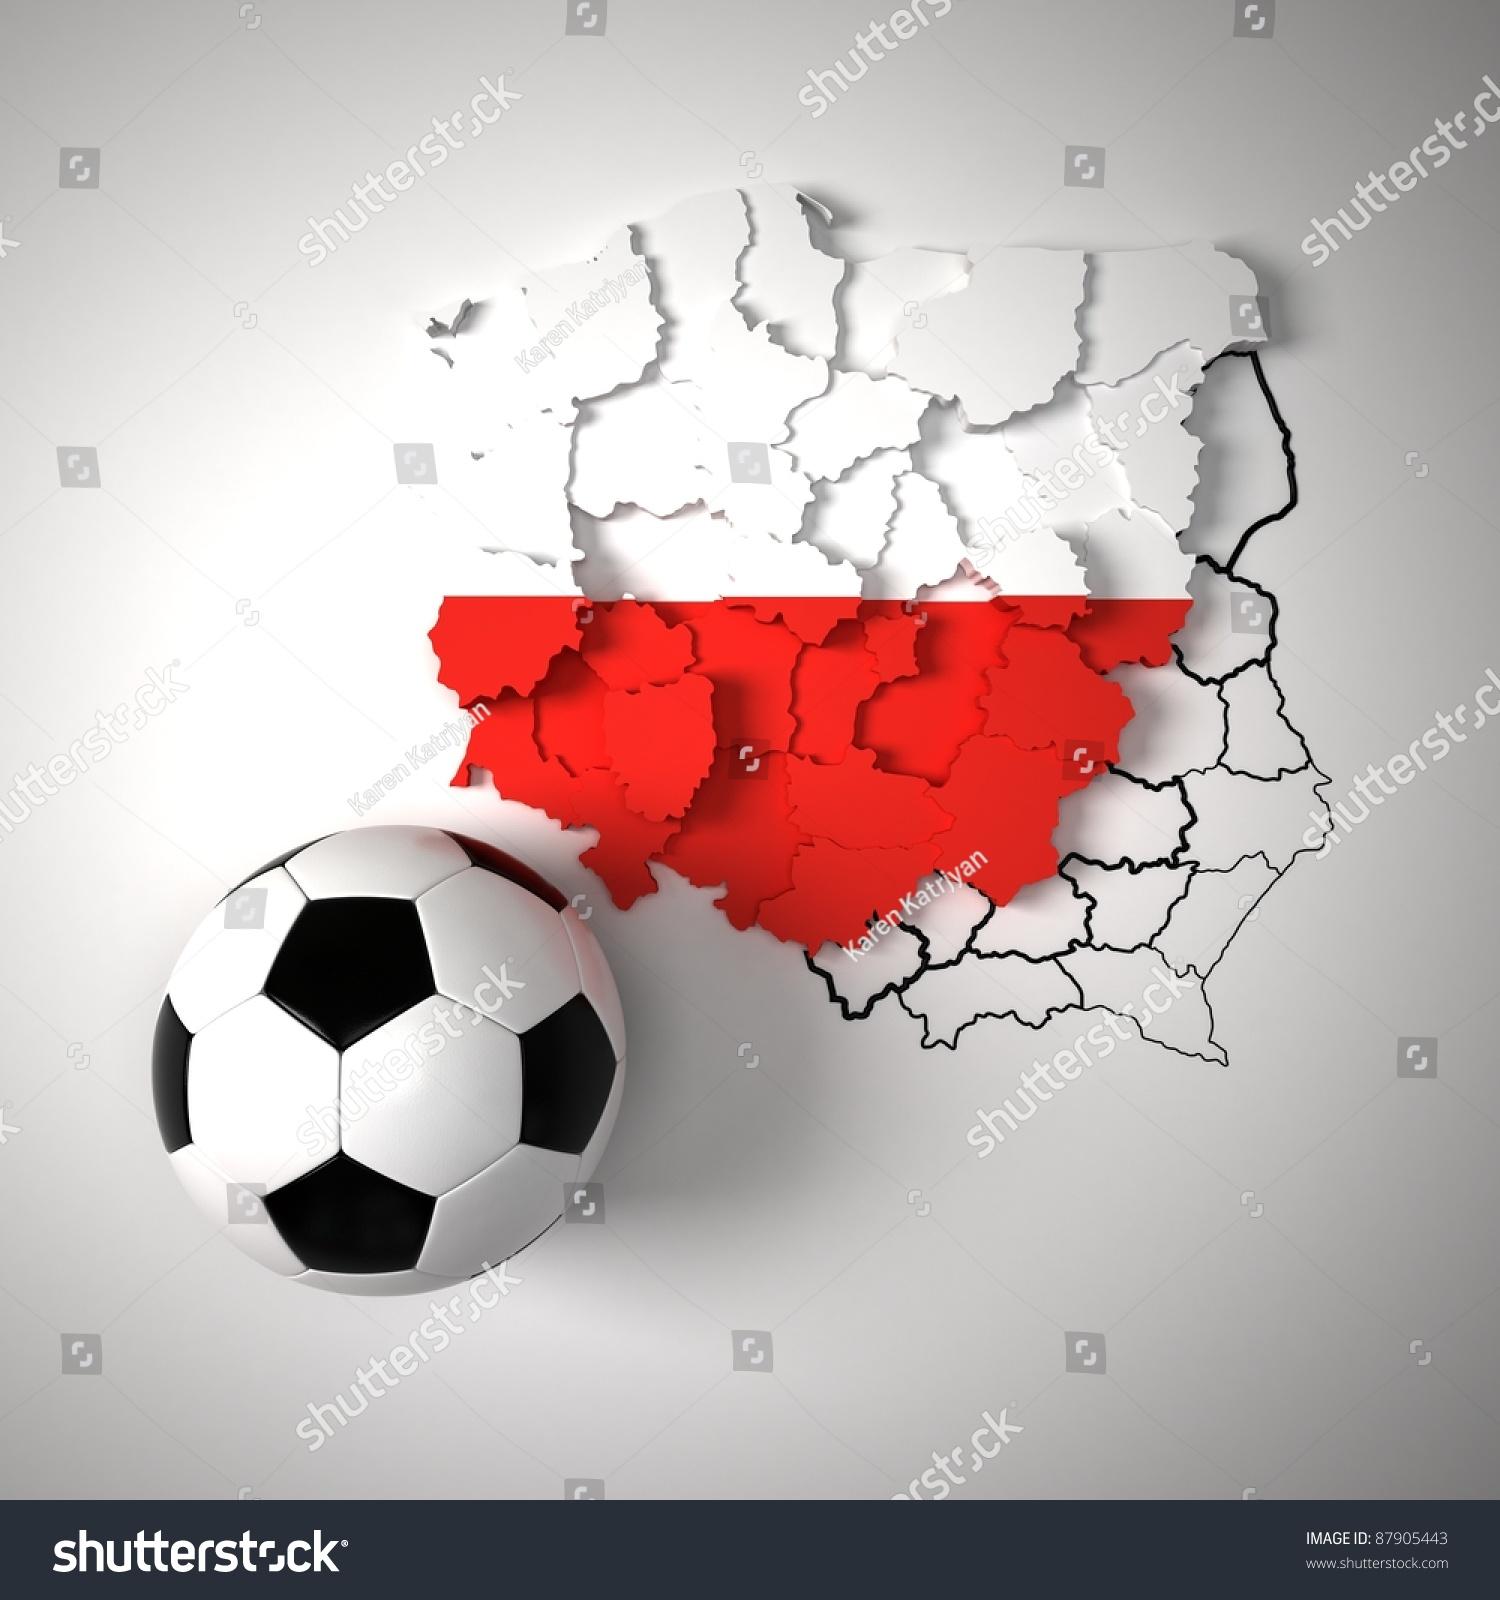 polish flag on map poland state stock illustration 87905443